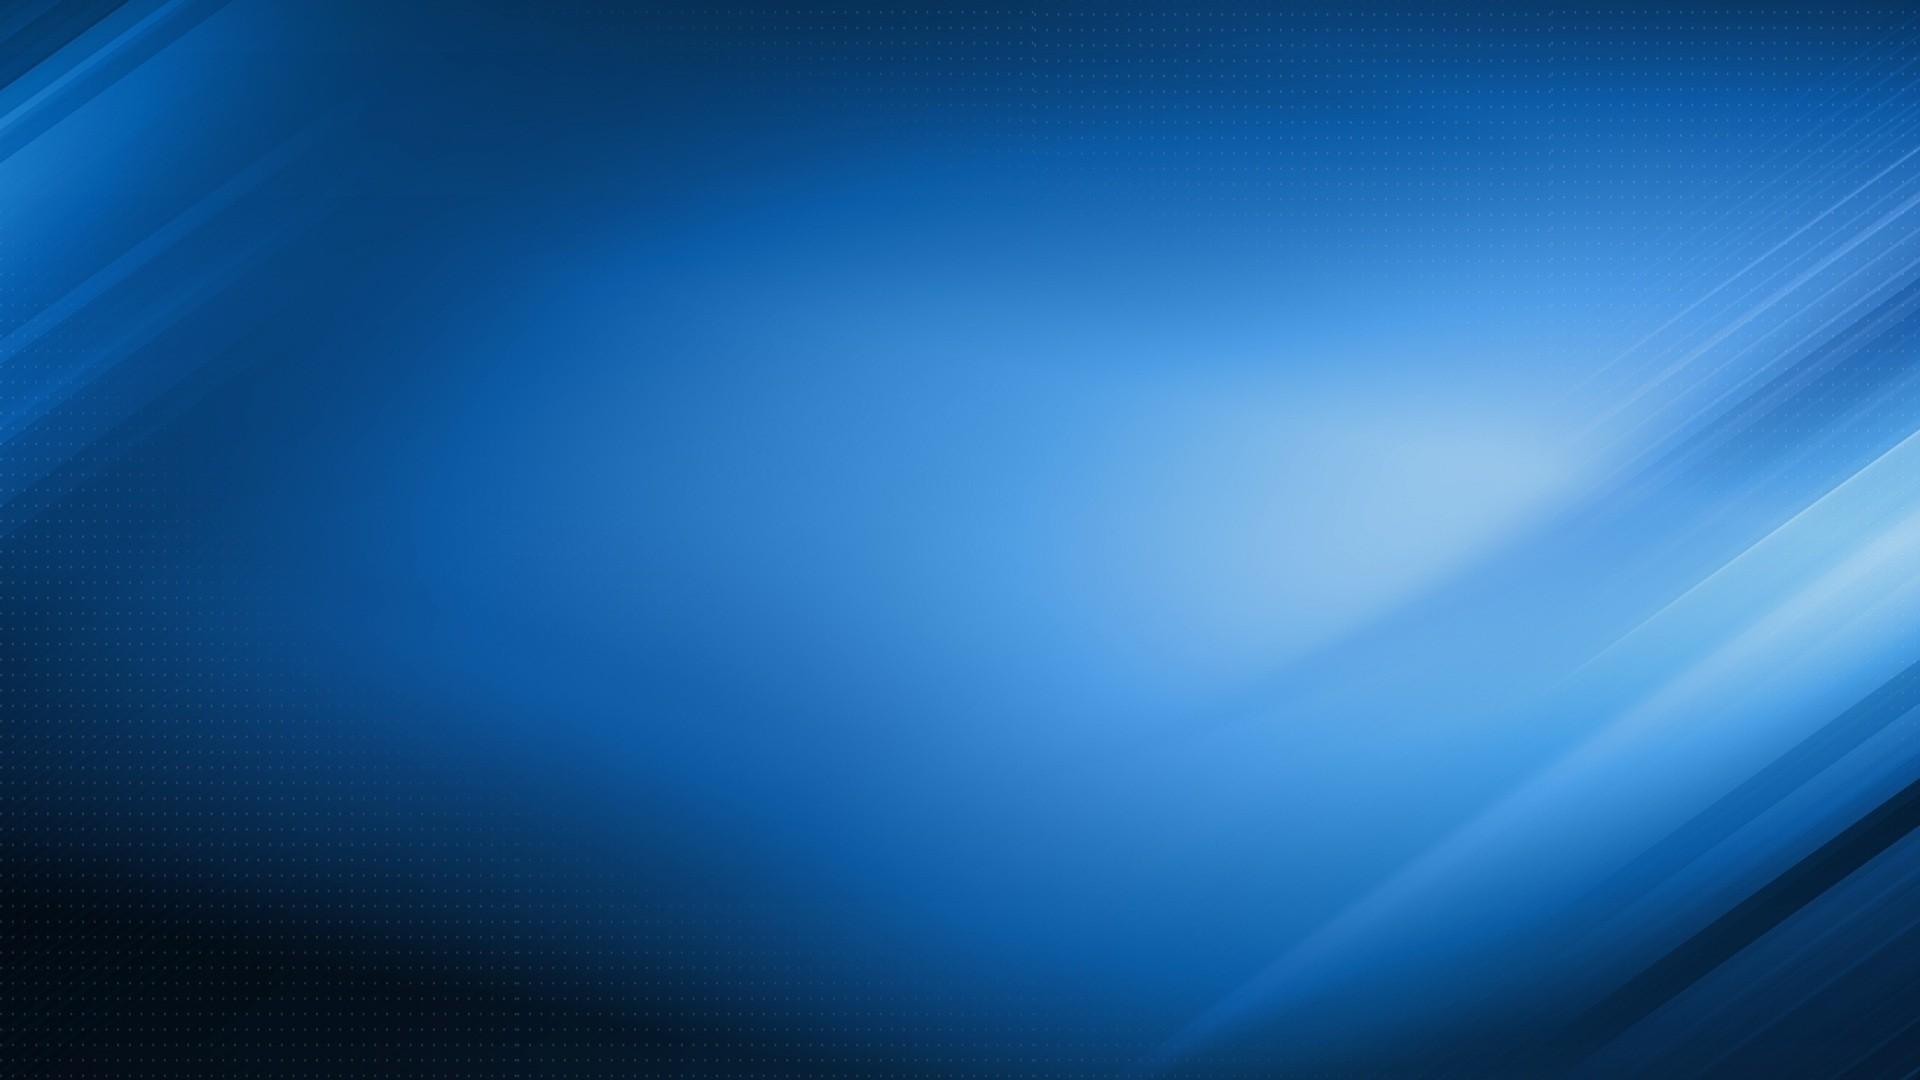 Spark Blue computer wallpaper